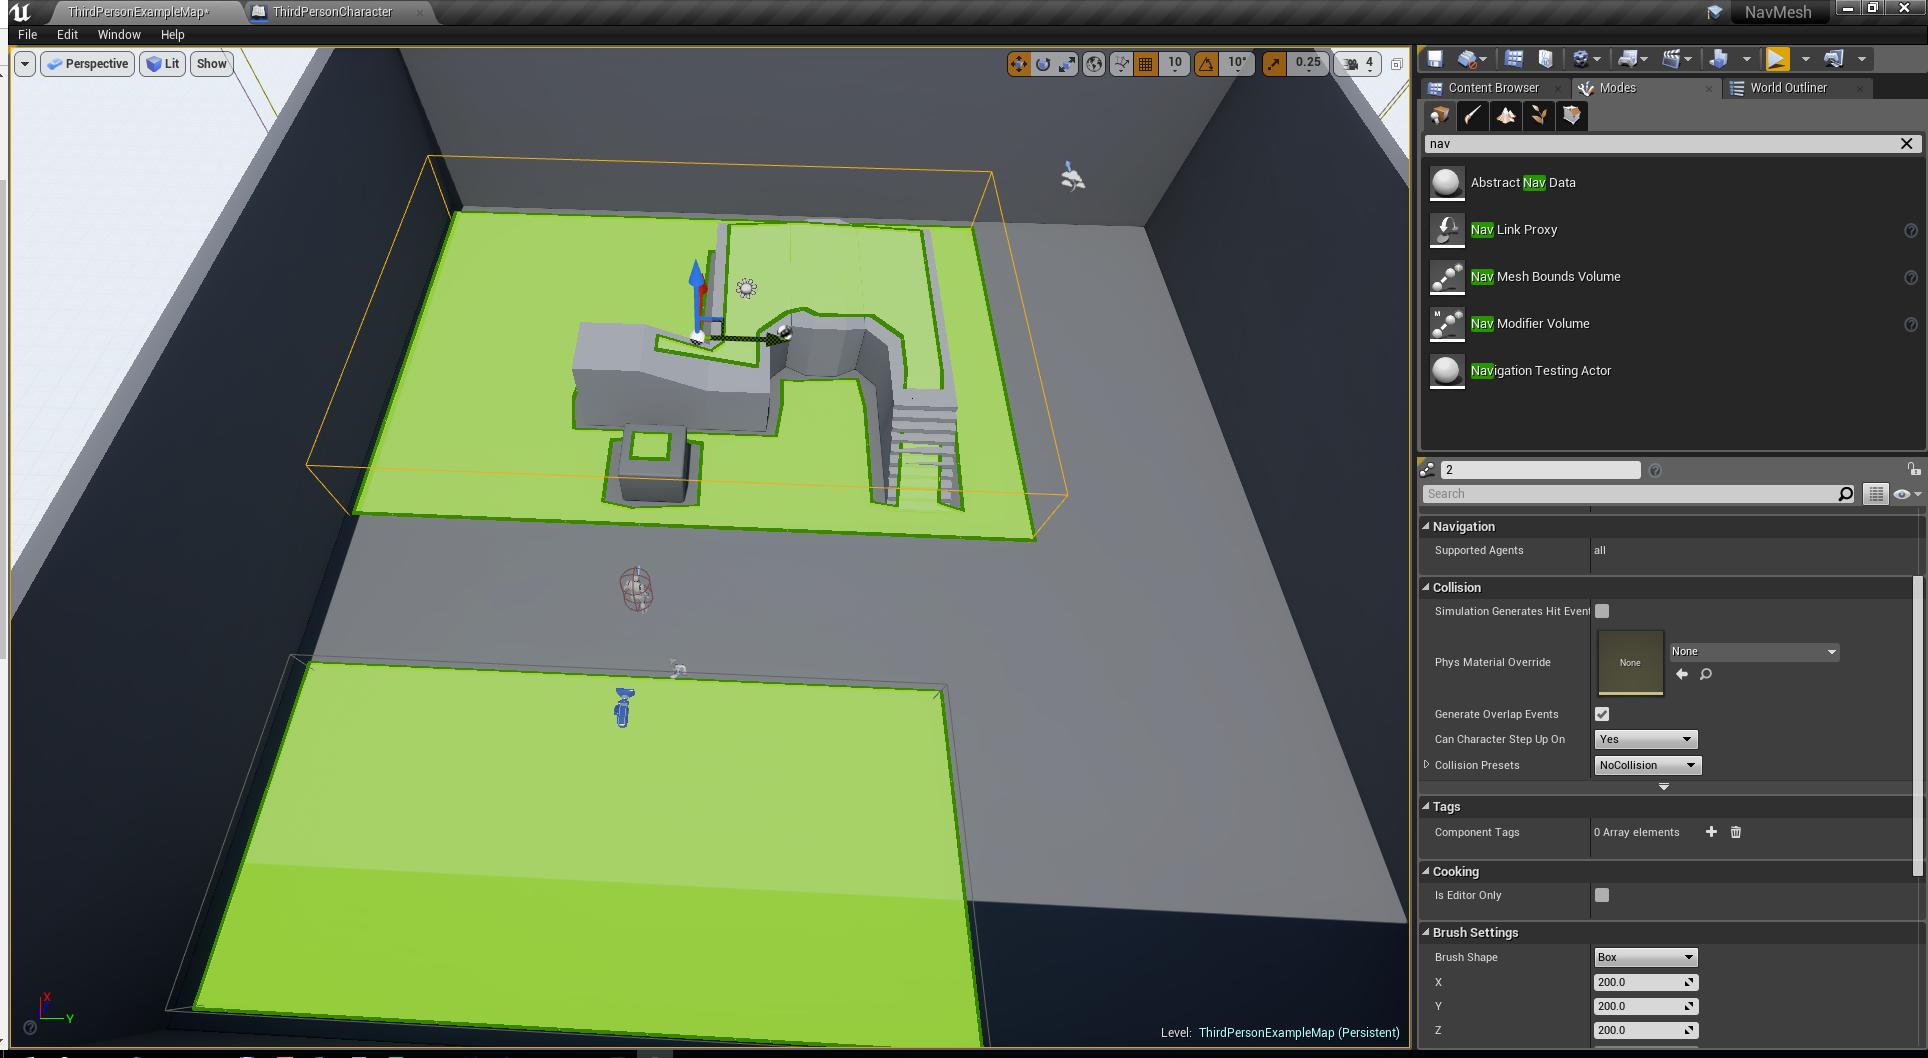 Unreal Engine 4 — как устроенна навигация в NavMeshBoundsVolume - 1